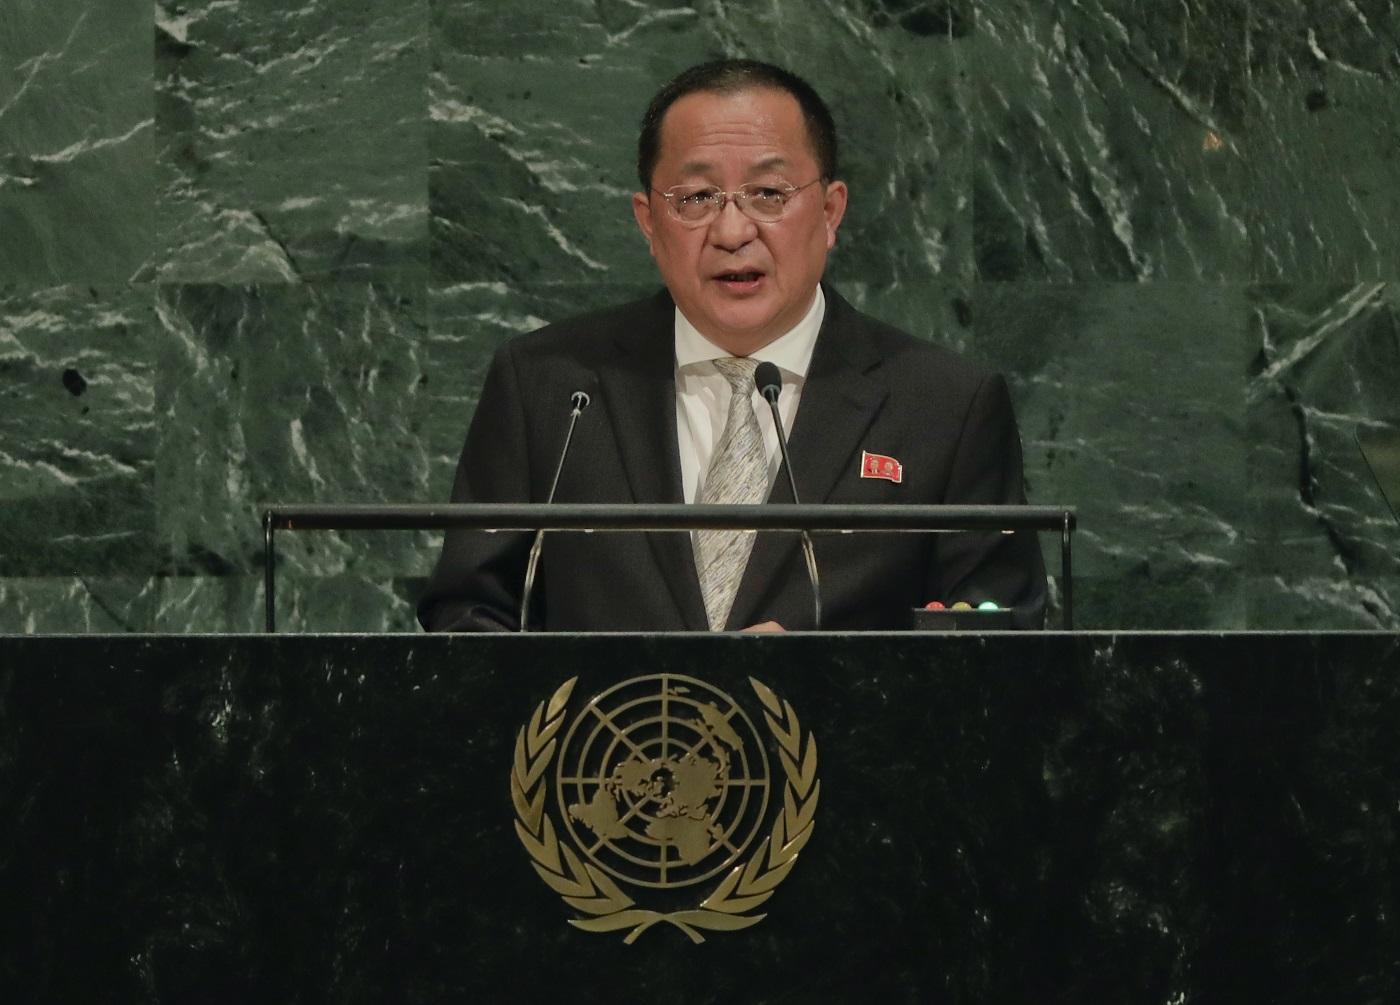 North Korea: Trump insult makes attack on US 'more inevitable'